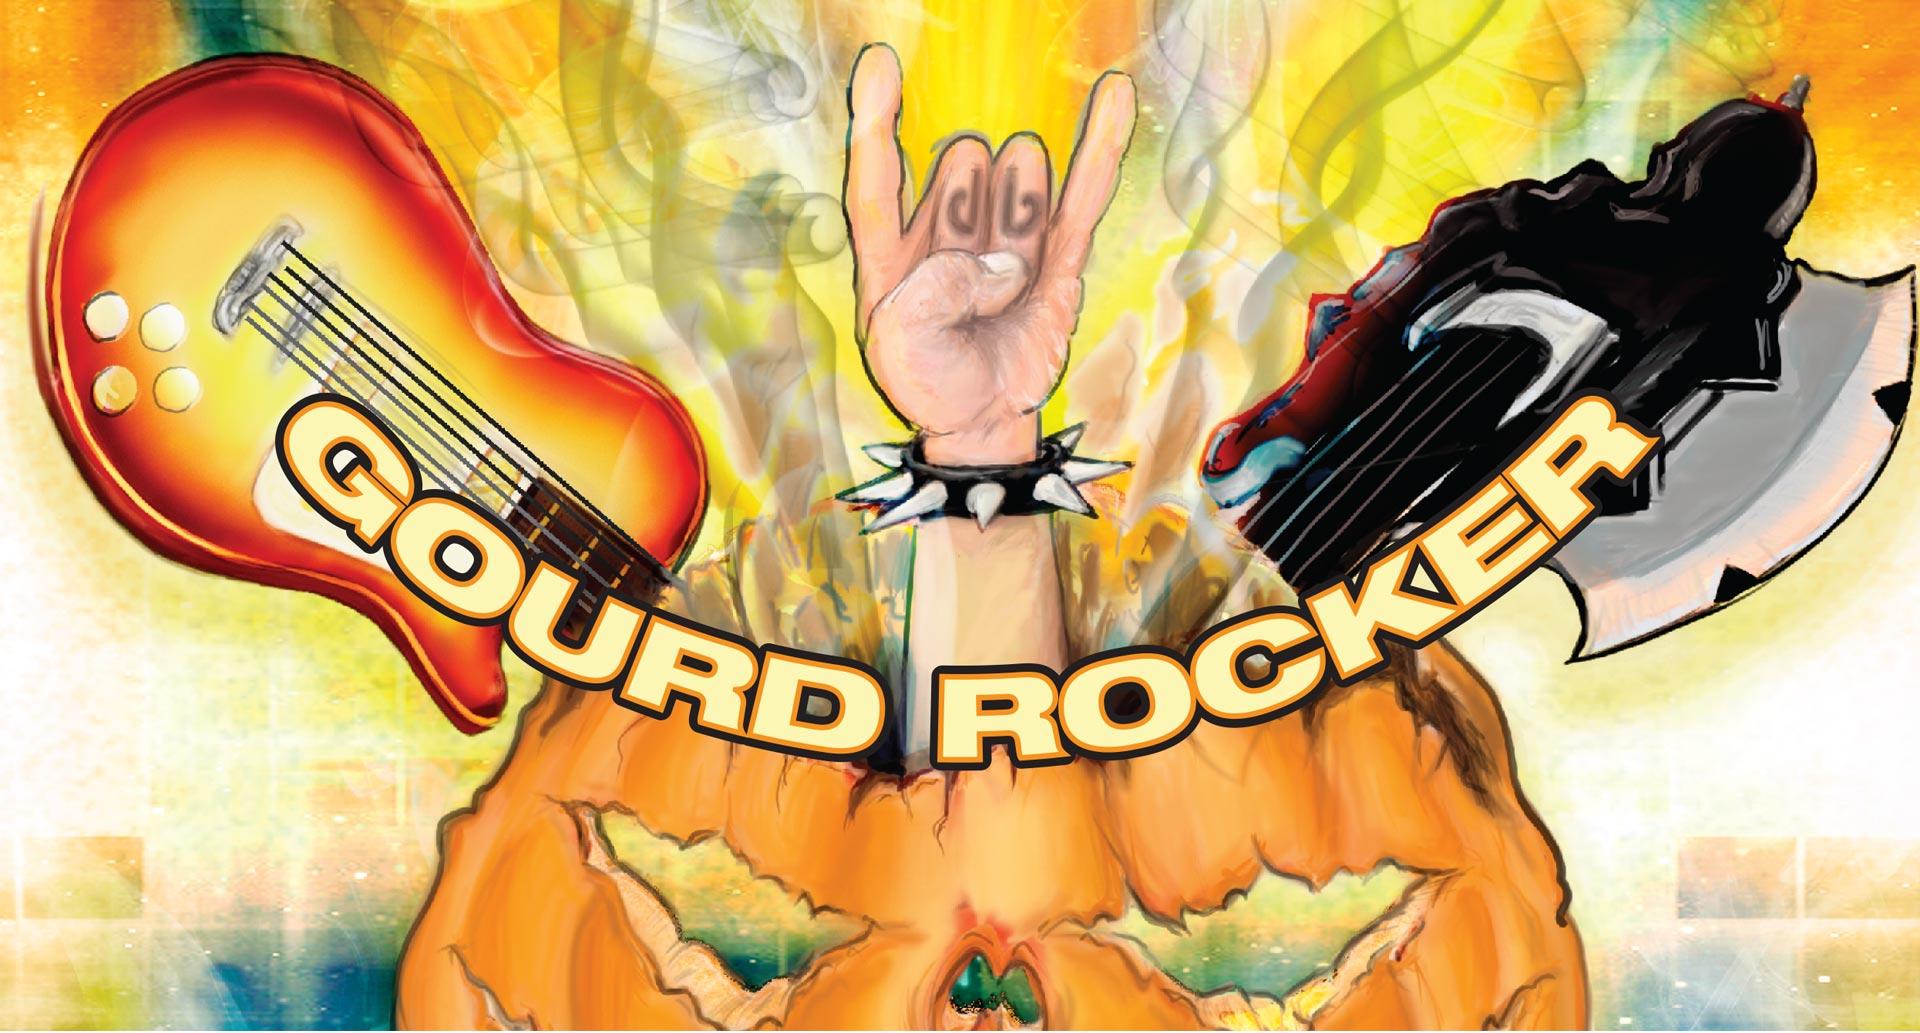 Gourd Rocker Imperial Pumpkin Porter